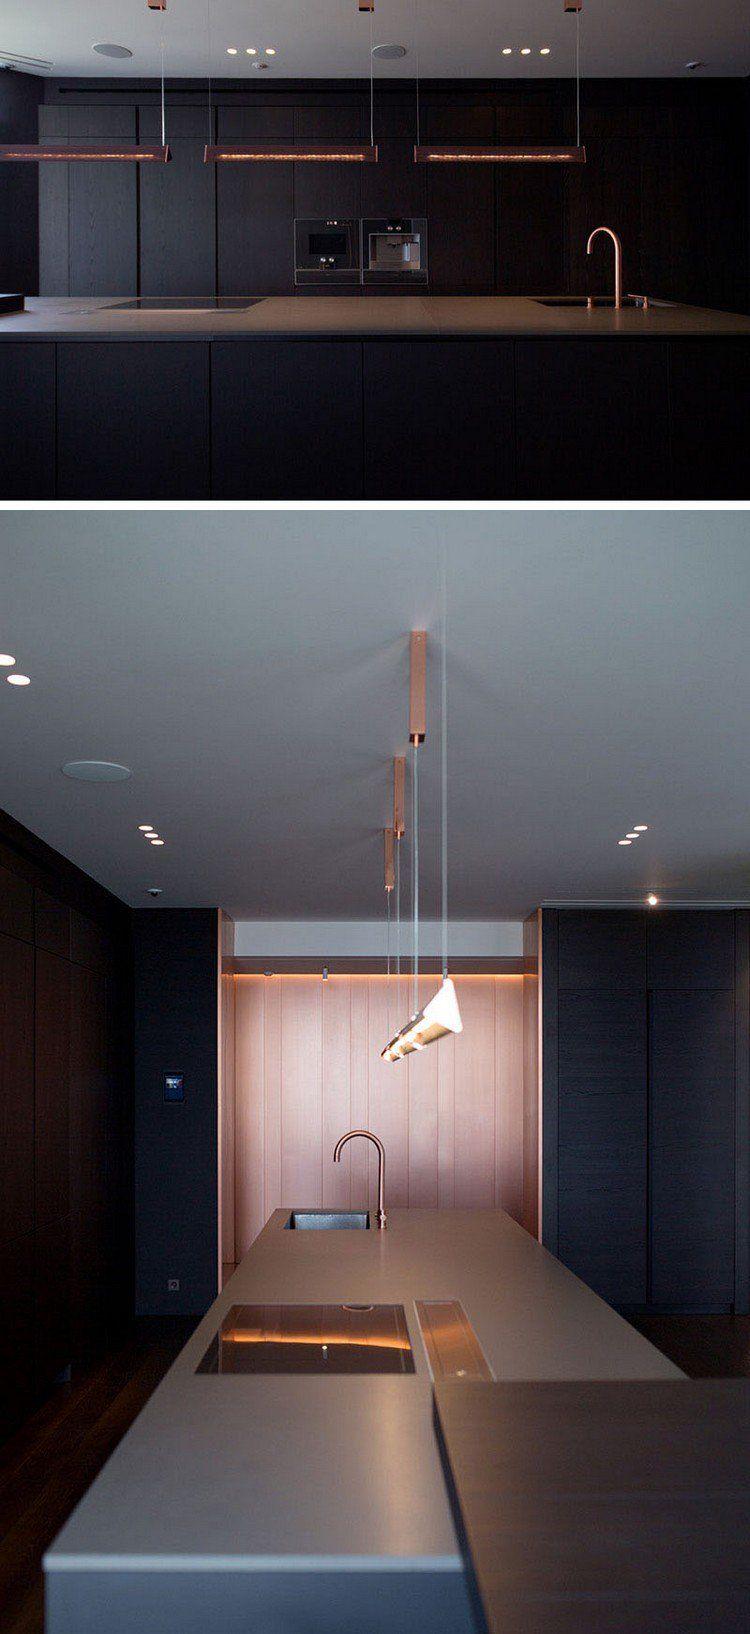 Luminaire Cuivre Design Cuisine Minimaliste Hyper Moderne #luminaire  #design #apartment